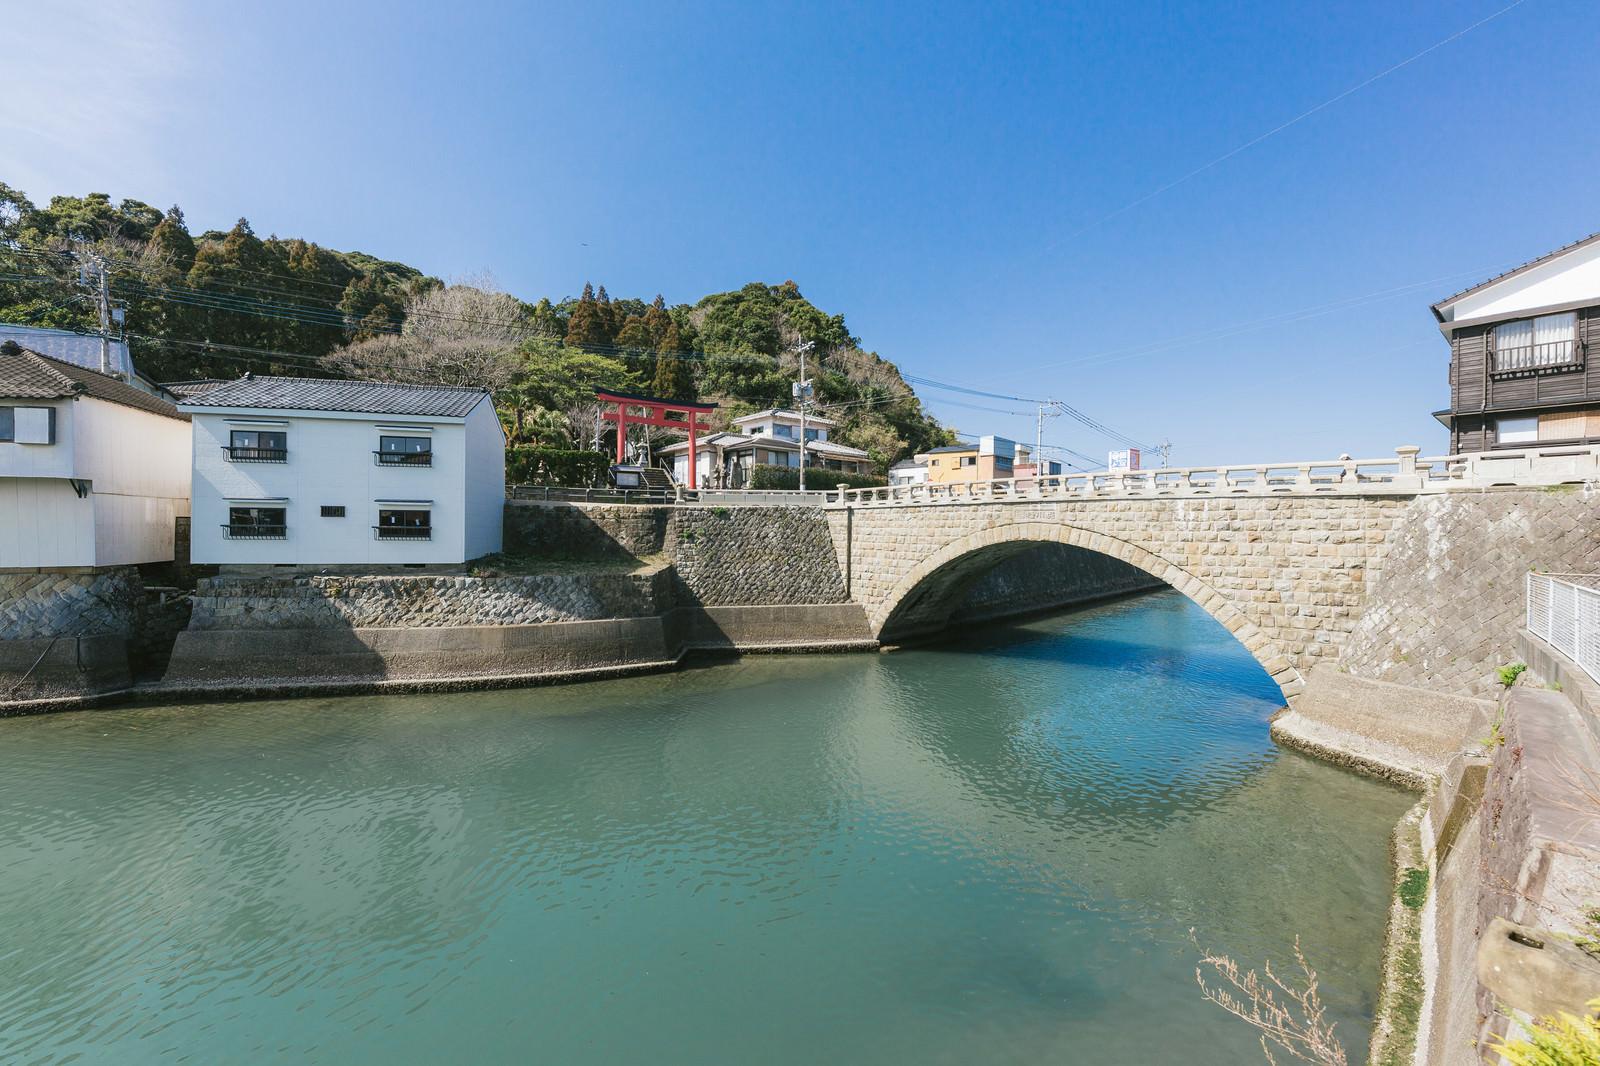 「乙姫橋と乙姫神社」の写真